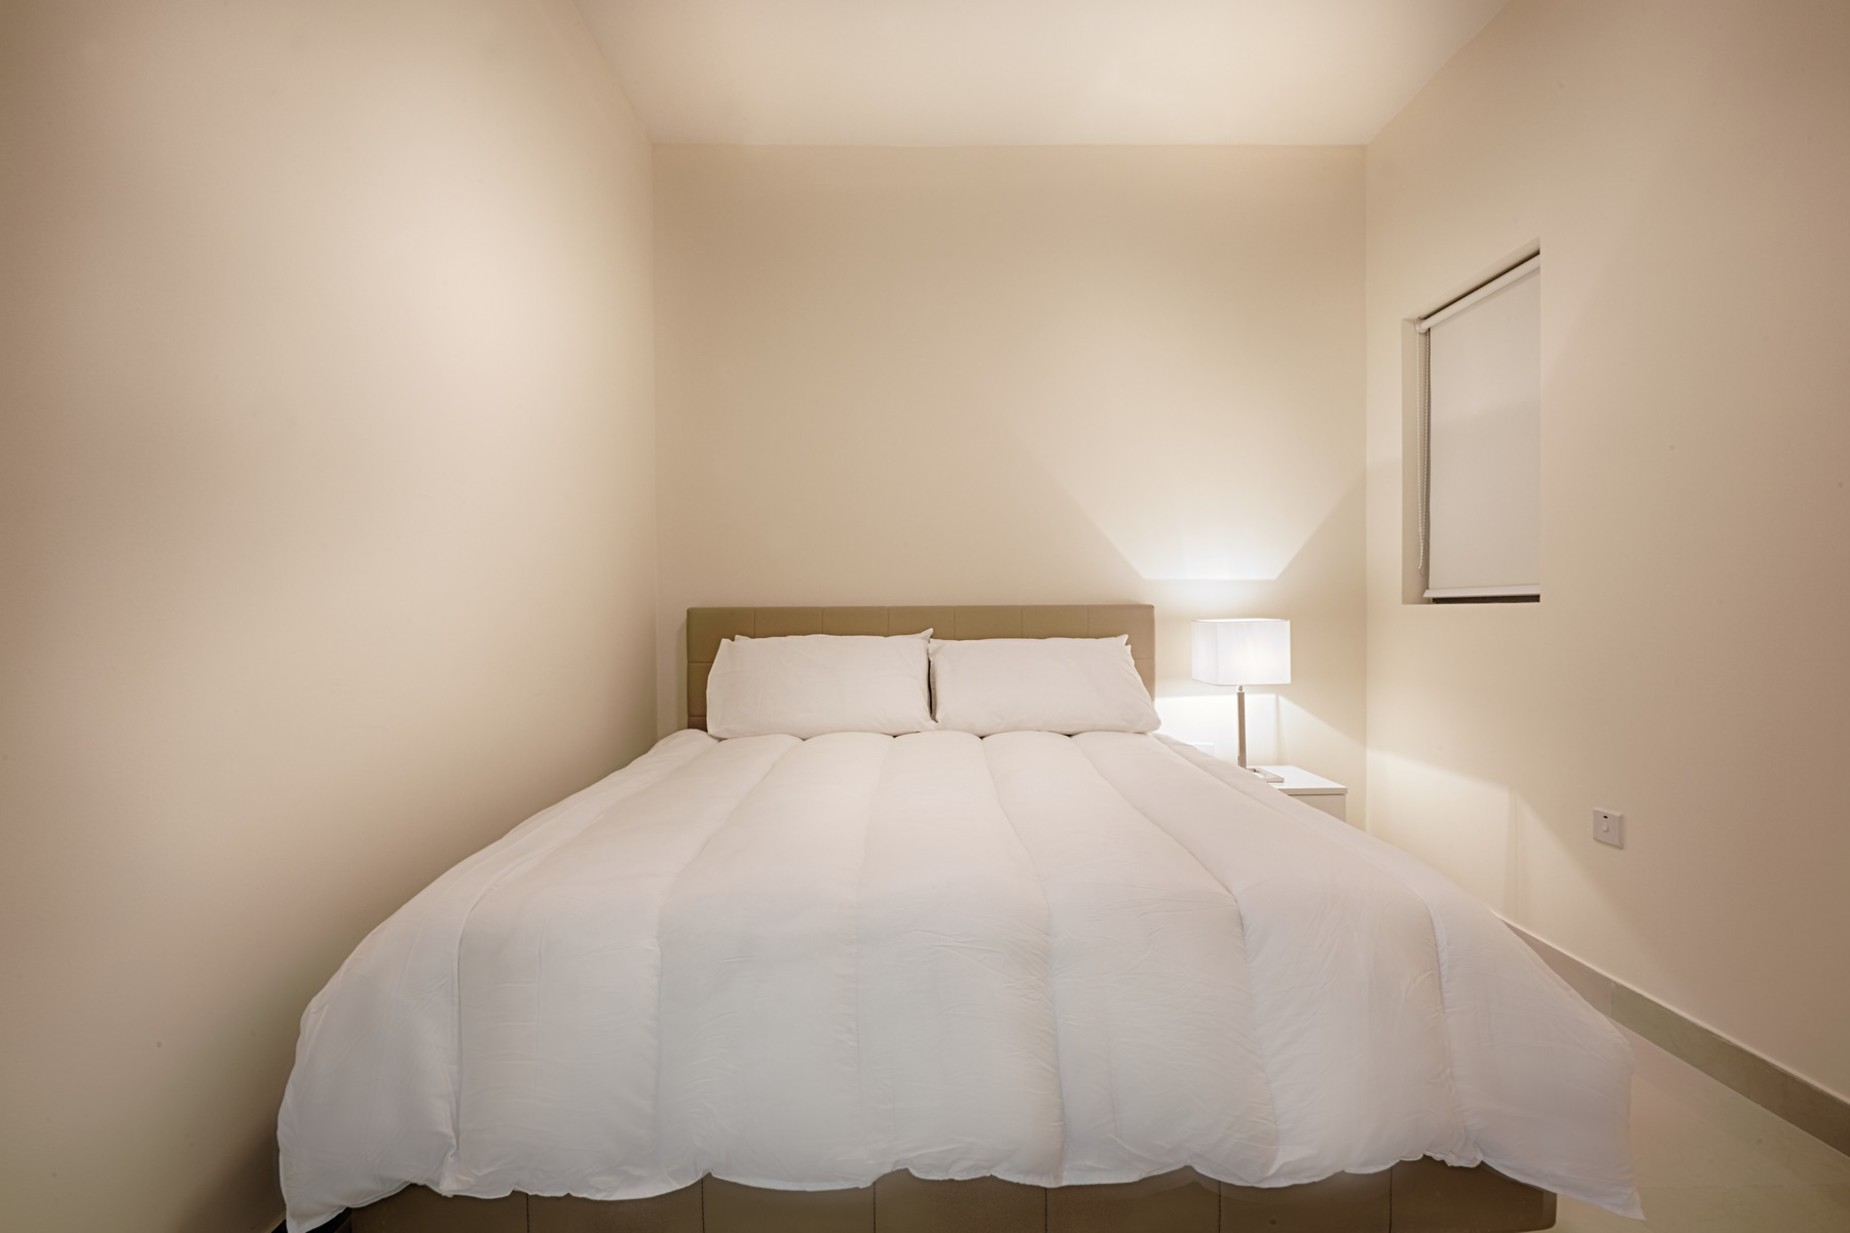 3 bed Apartment For Rent in Naxxar, Naxxar - thumb 5